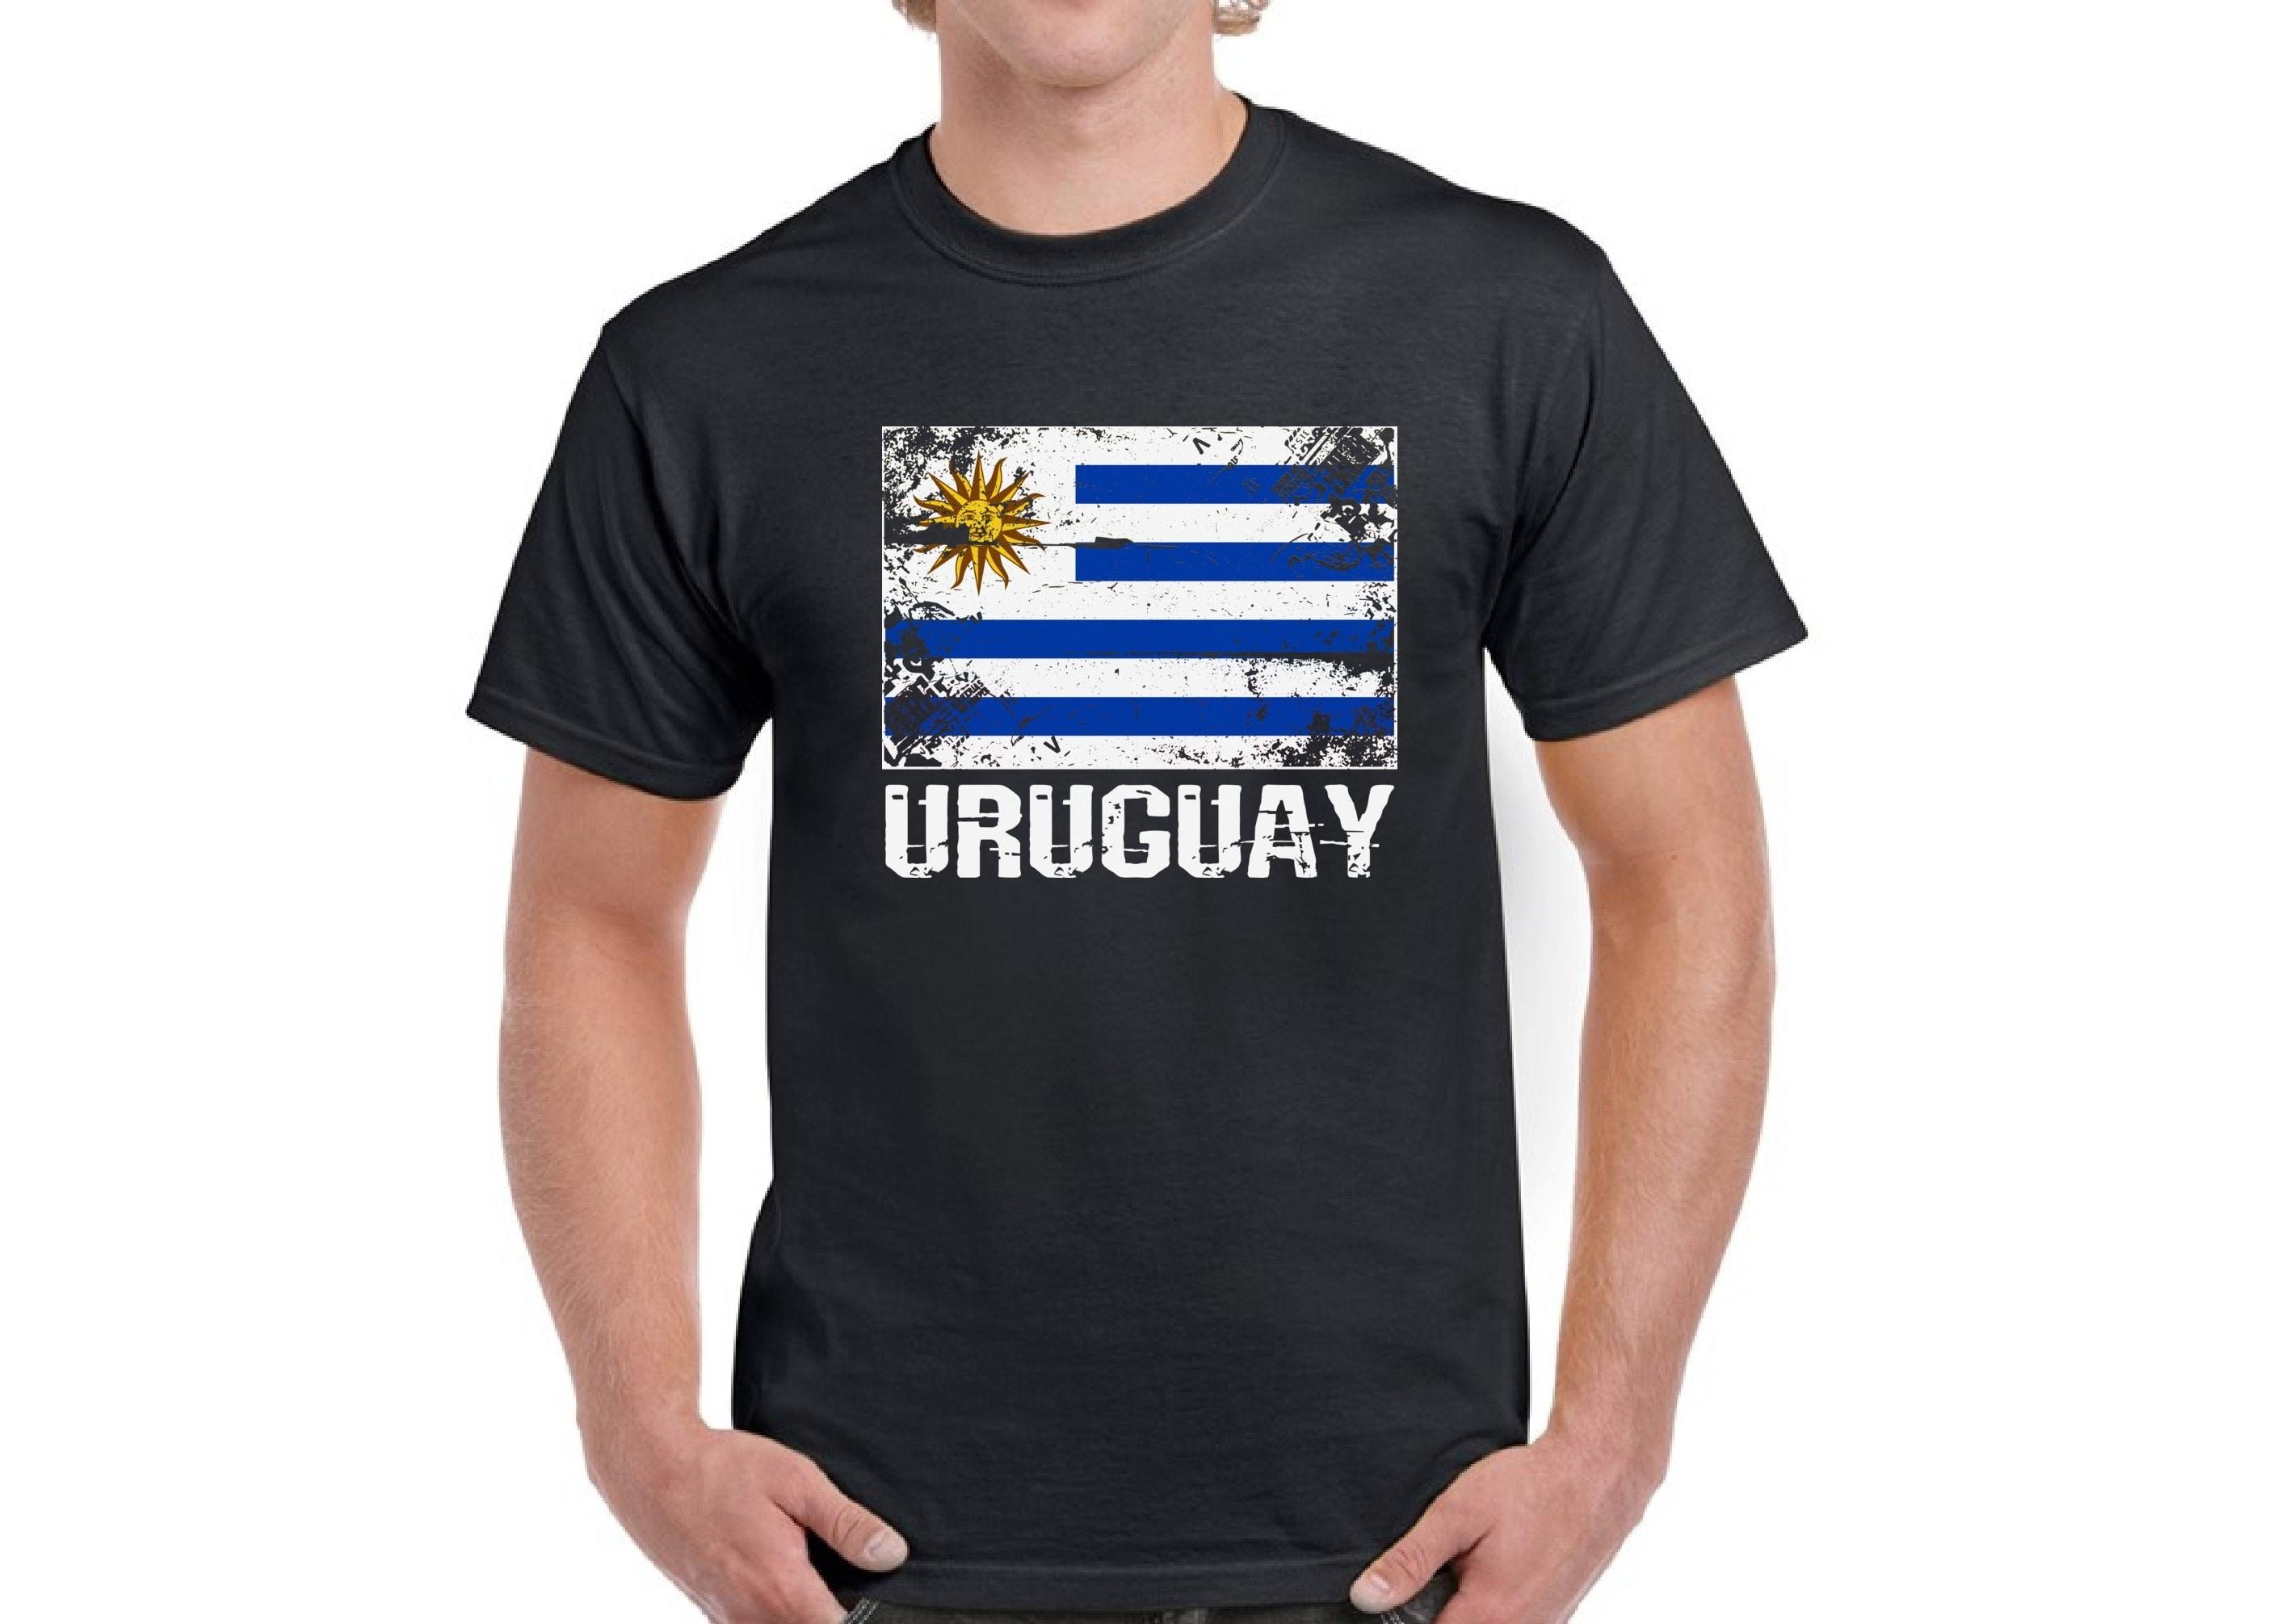 Uruguay Shirt For Men Uruguay Flag Shirt Uruguayan Soccer Shirts Uruguay 2018 T-shirt Gifts From Uruguay Uruguayan Mens Shirt Uruguay Gifts SweatShirt